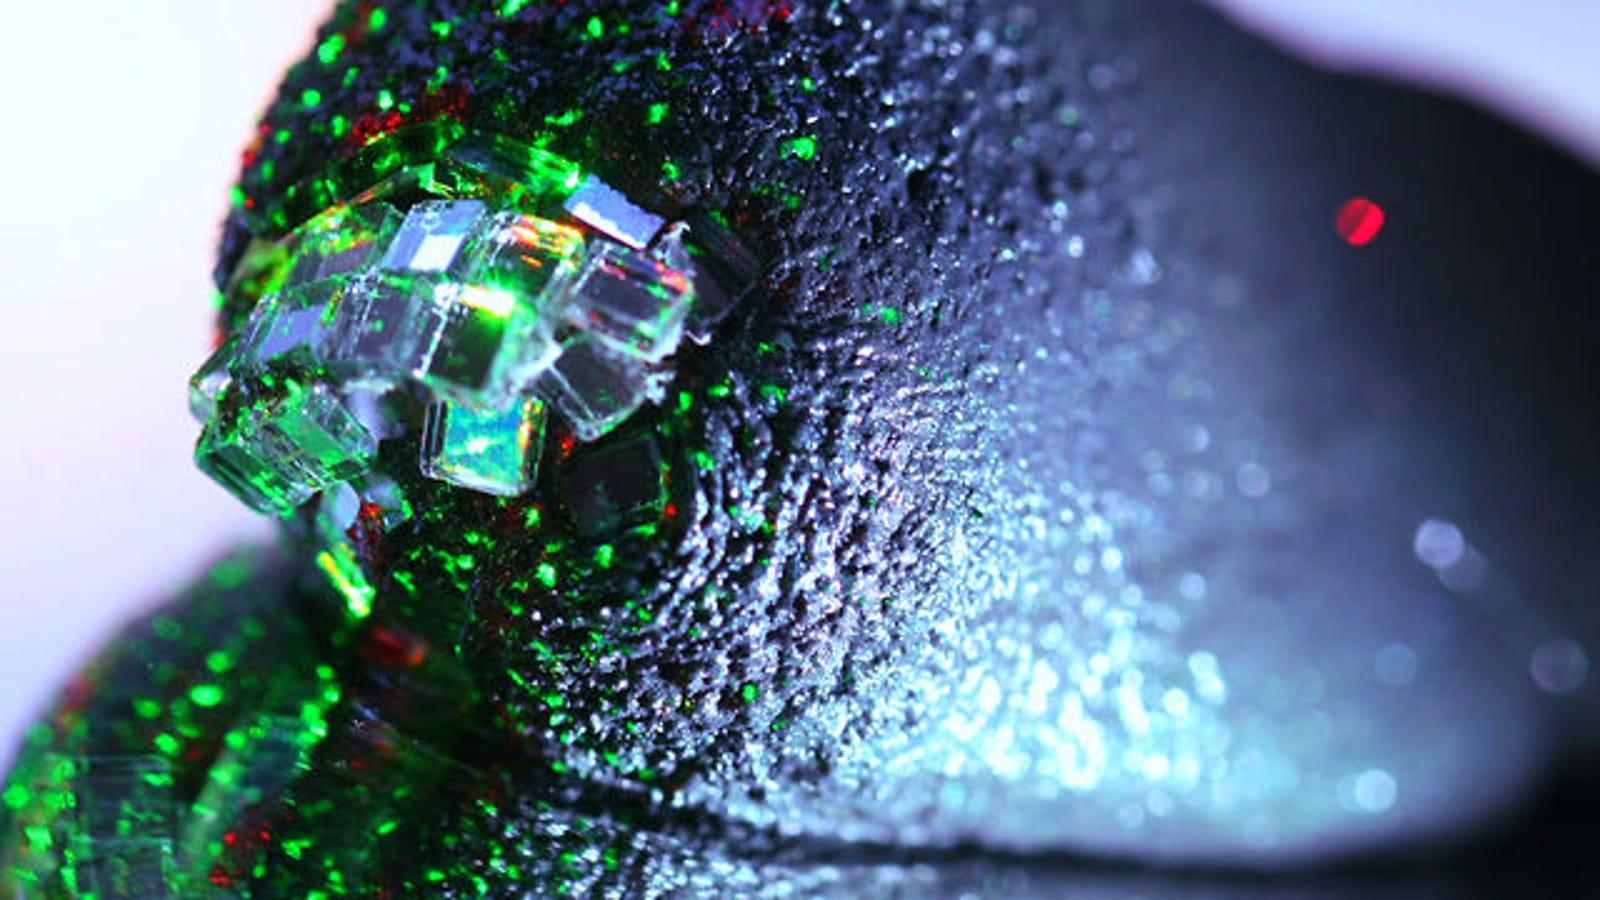 Plastilina magnética, el extraño material que devora objetos